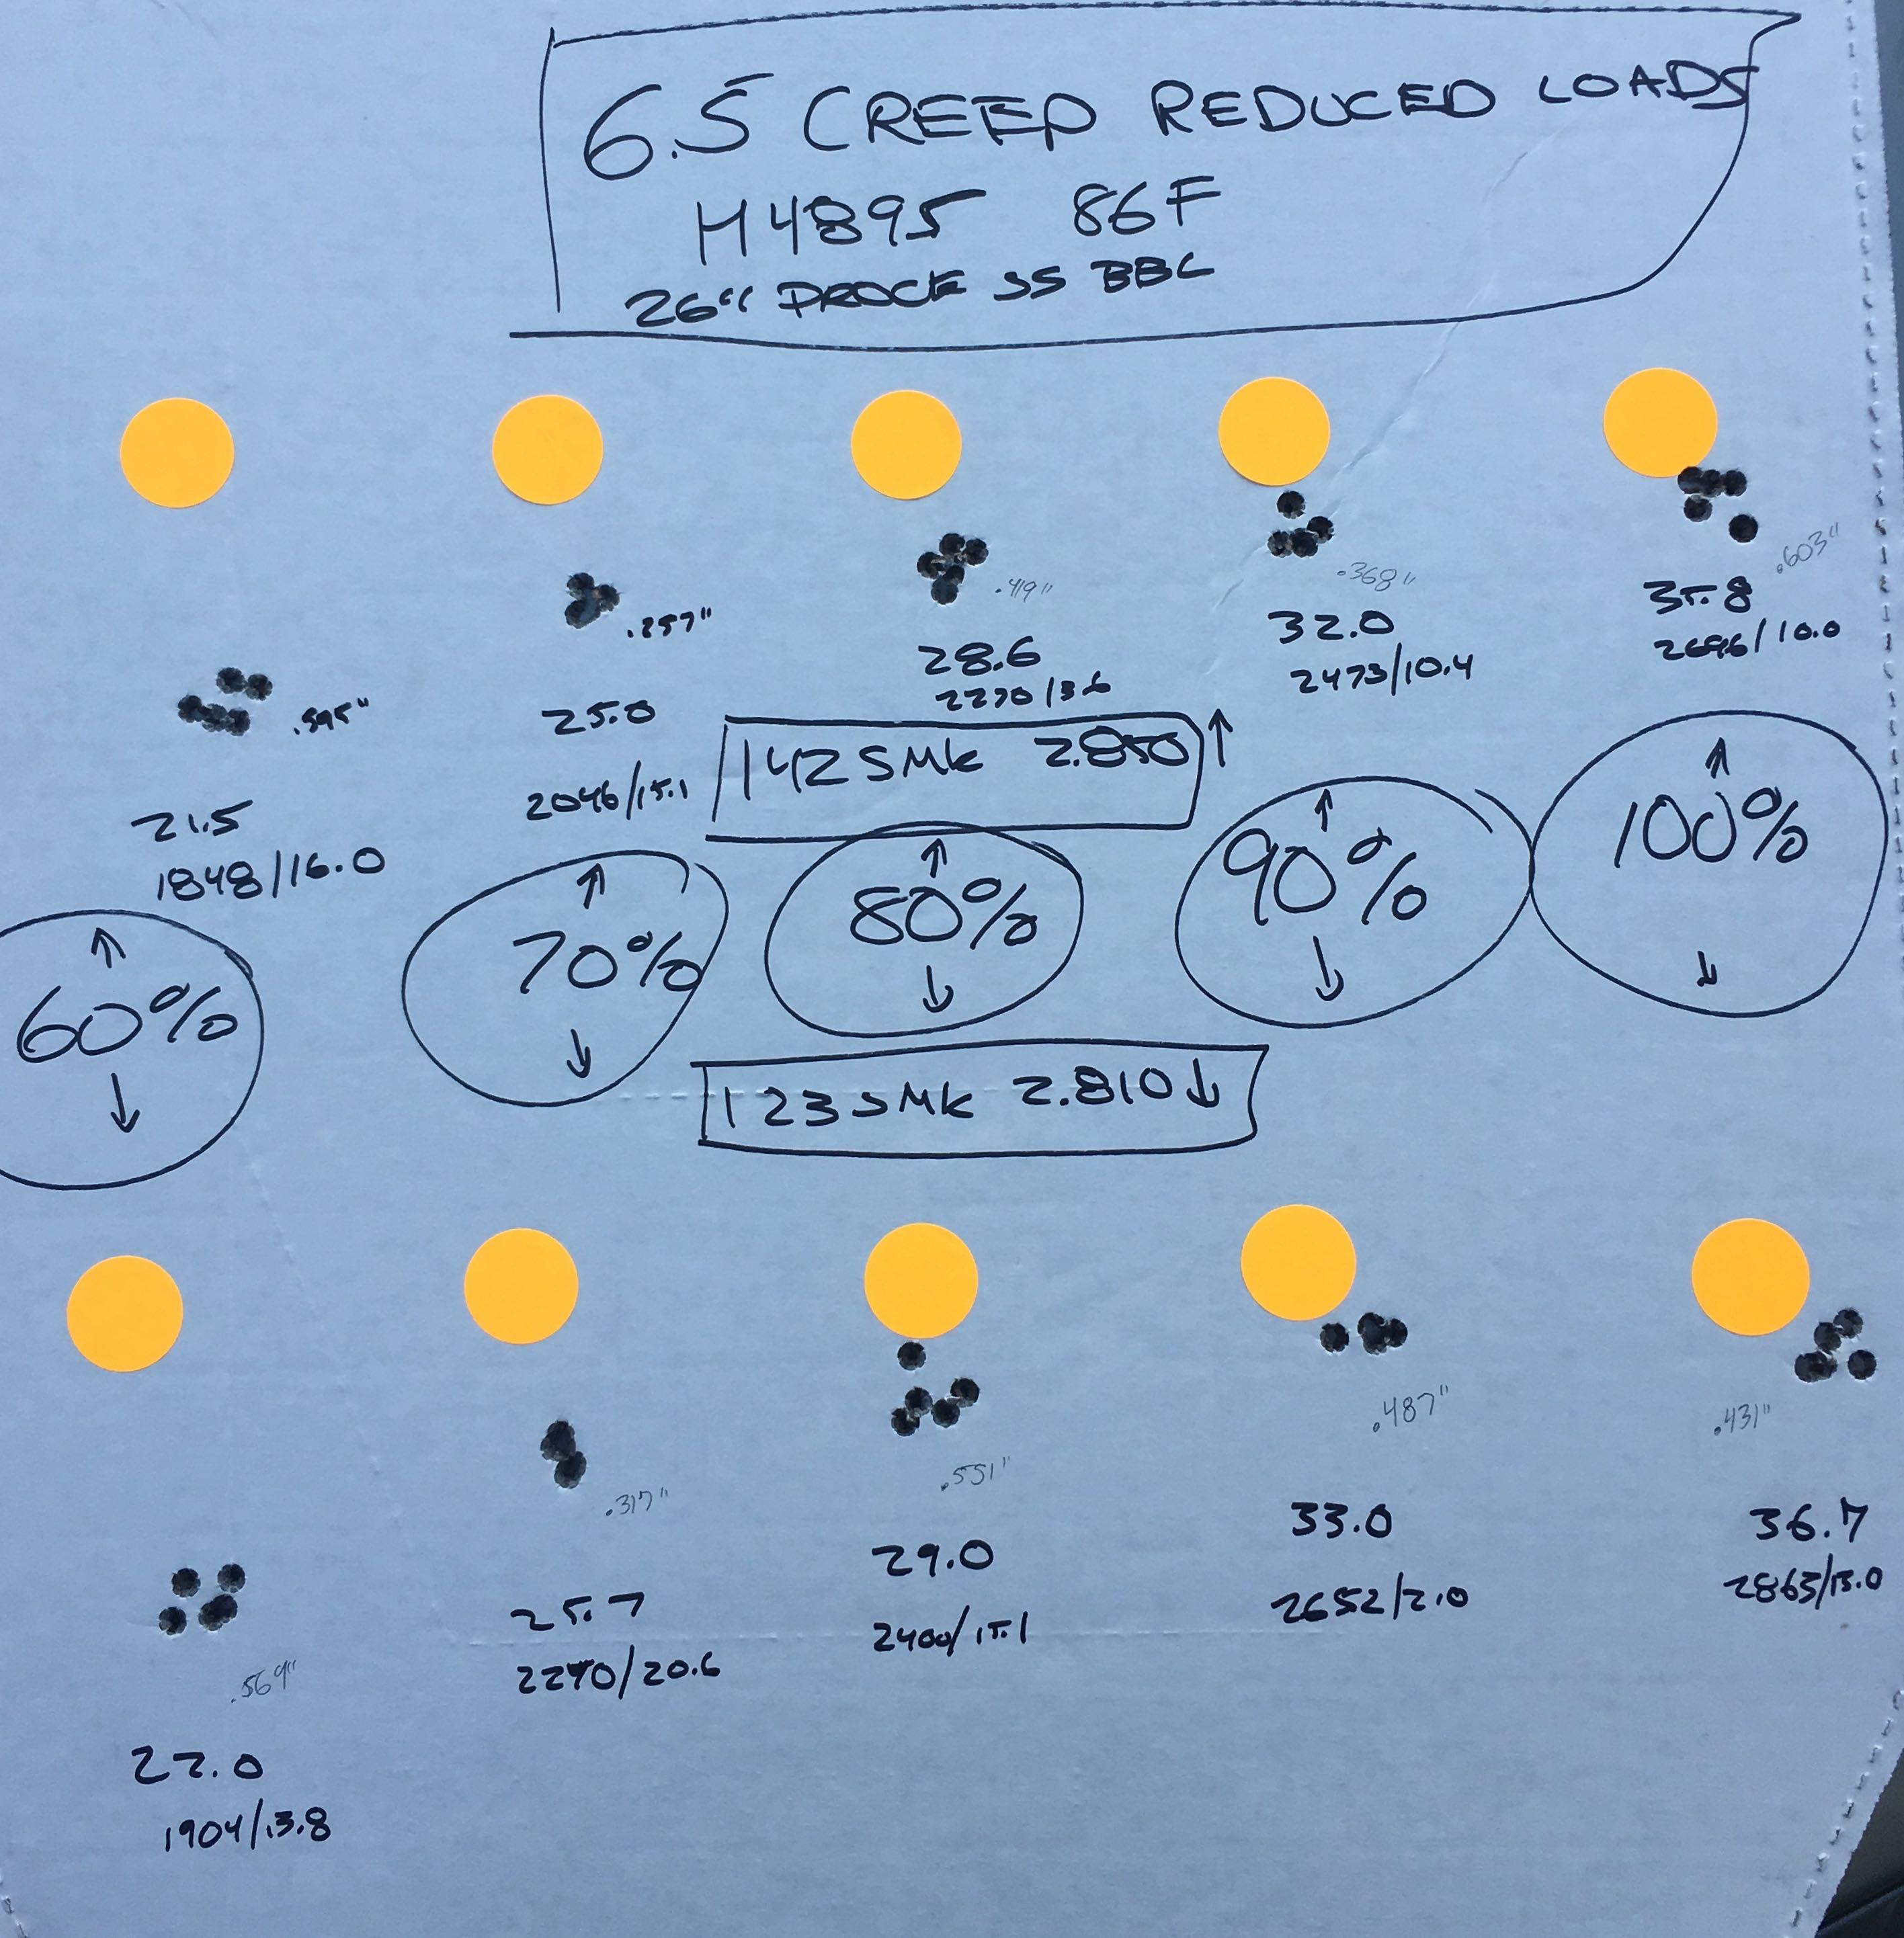 6 5 Creedmoor H4895 reduced loads: 123 SMK and 142 SMK